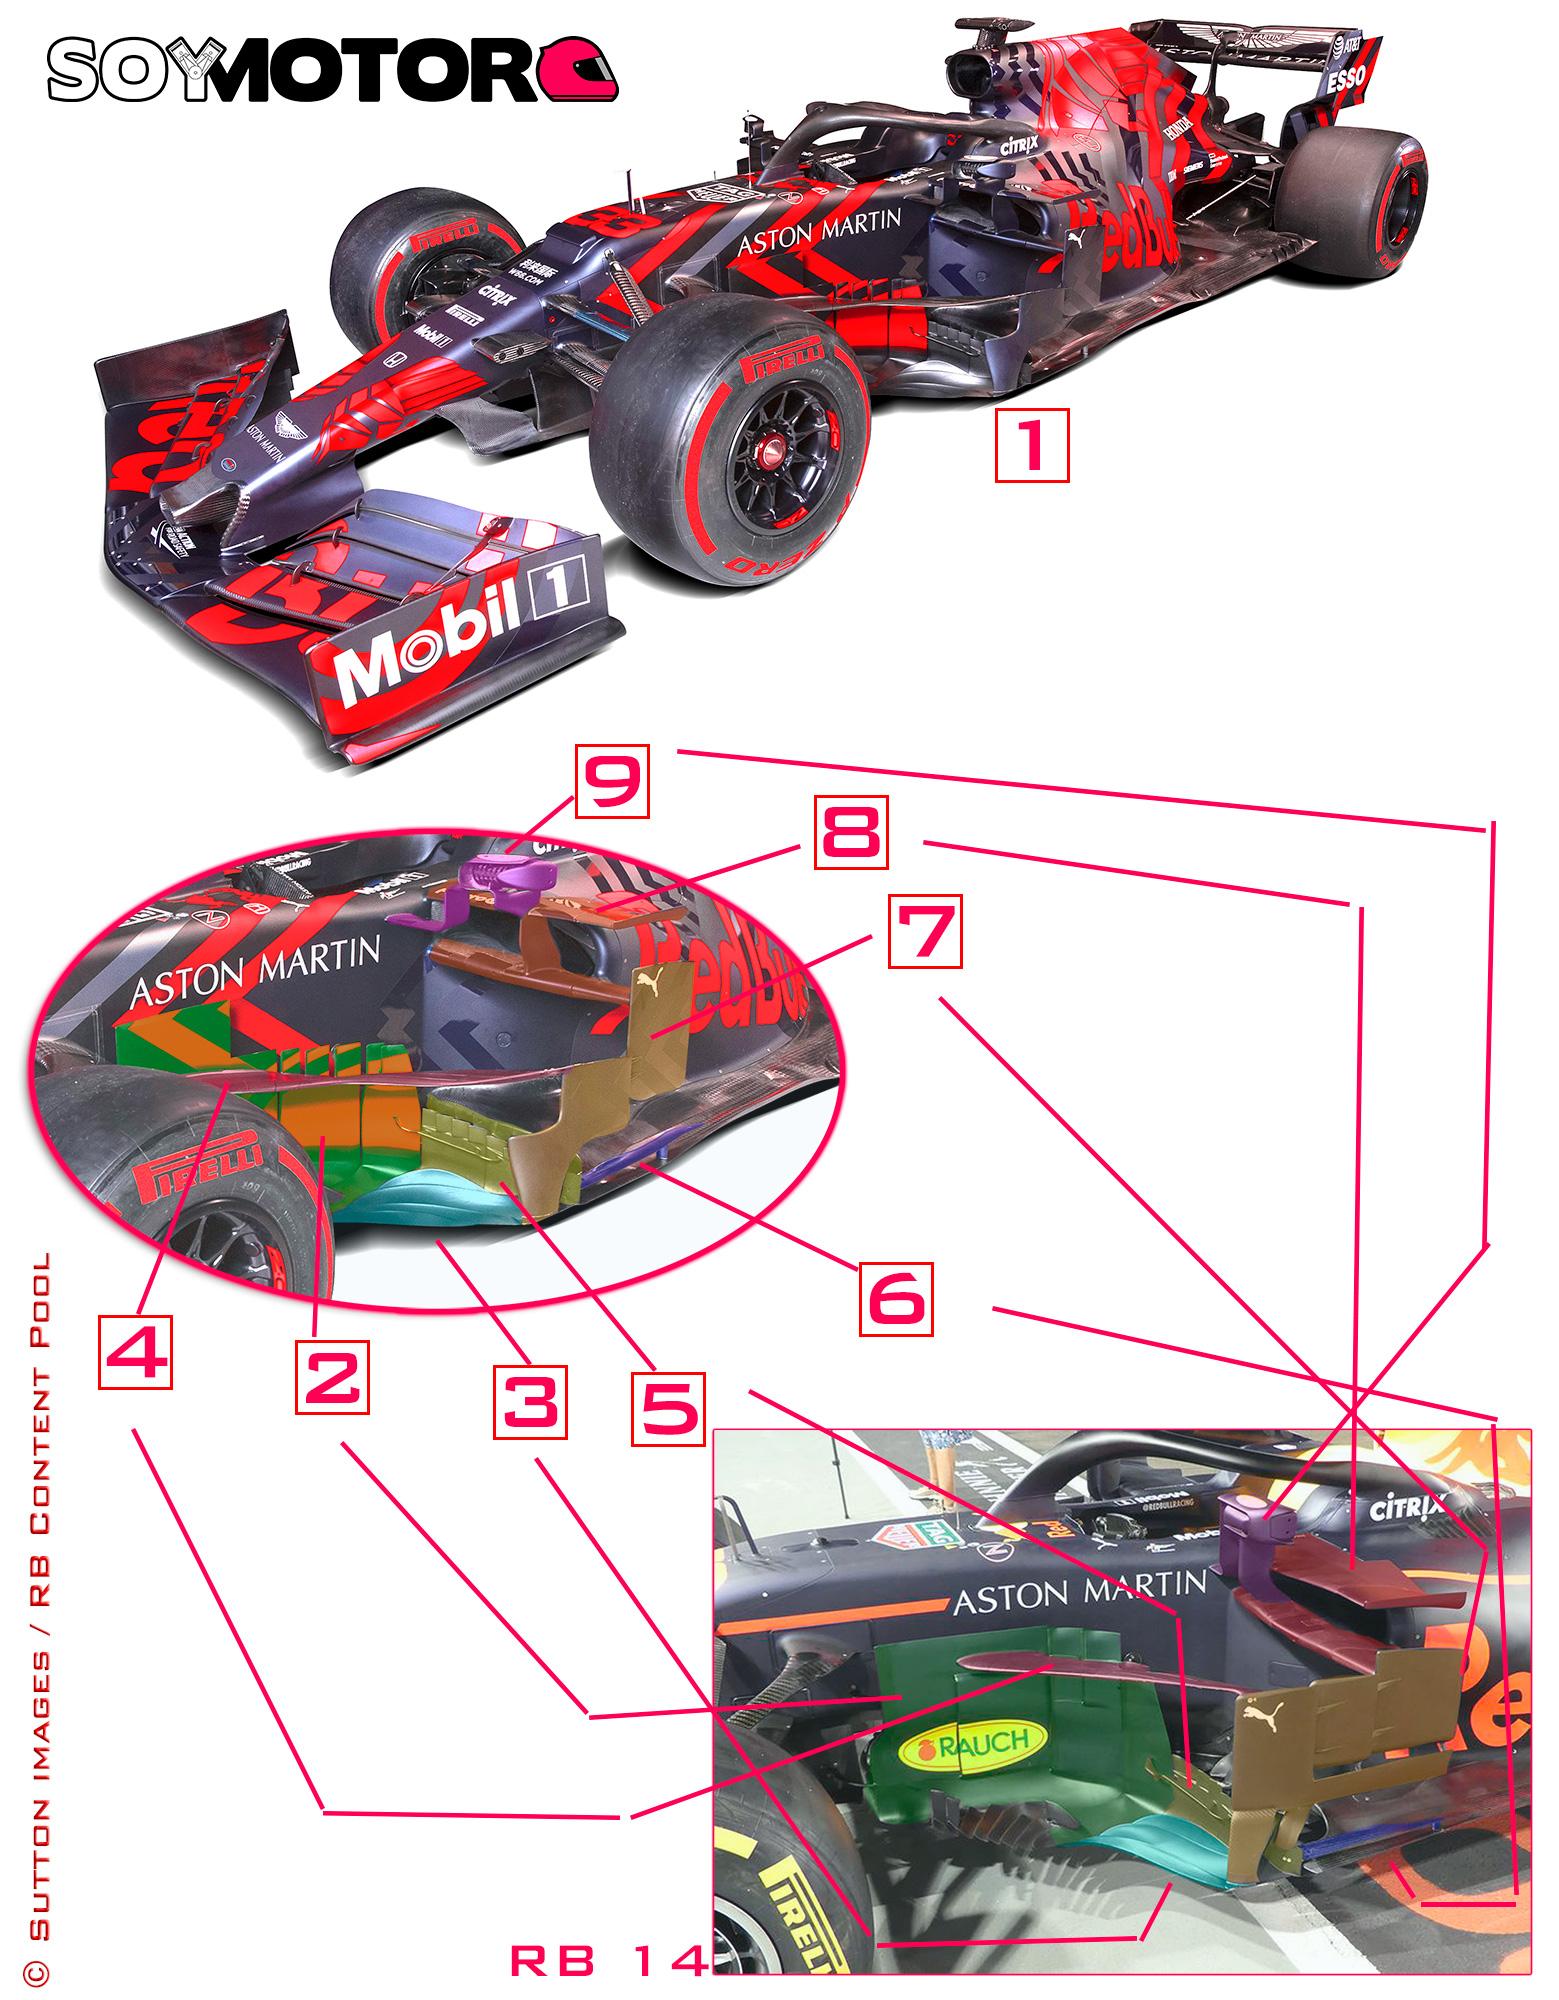 red-bull-bargeboard-soymotor.jpg